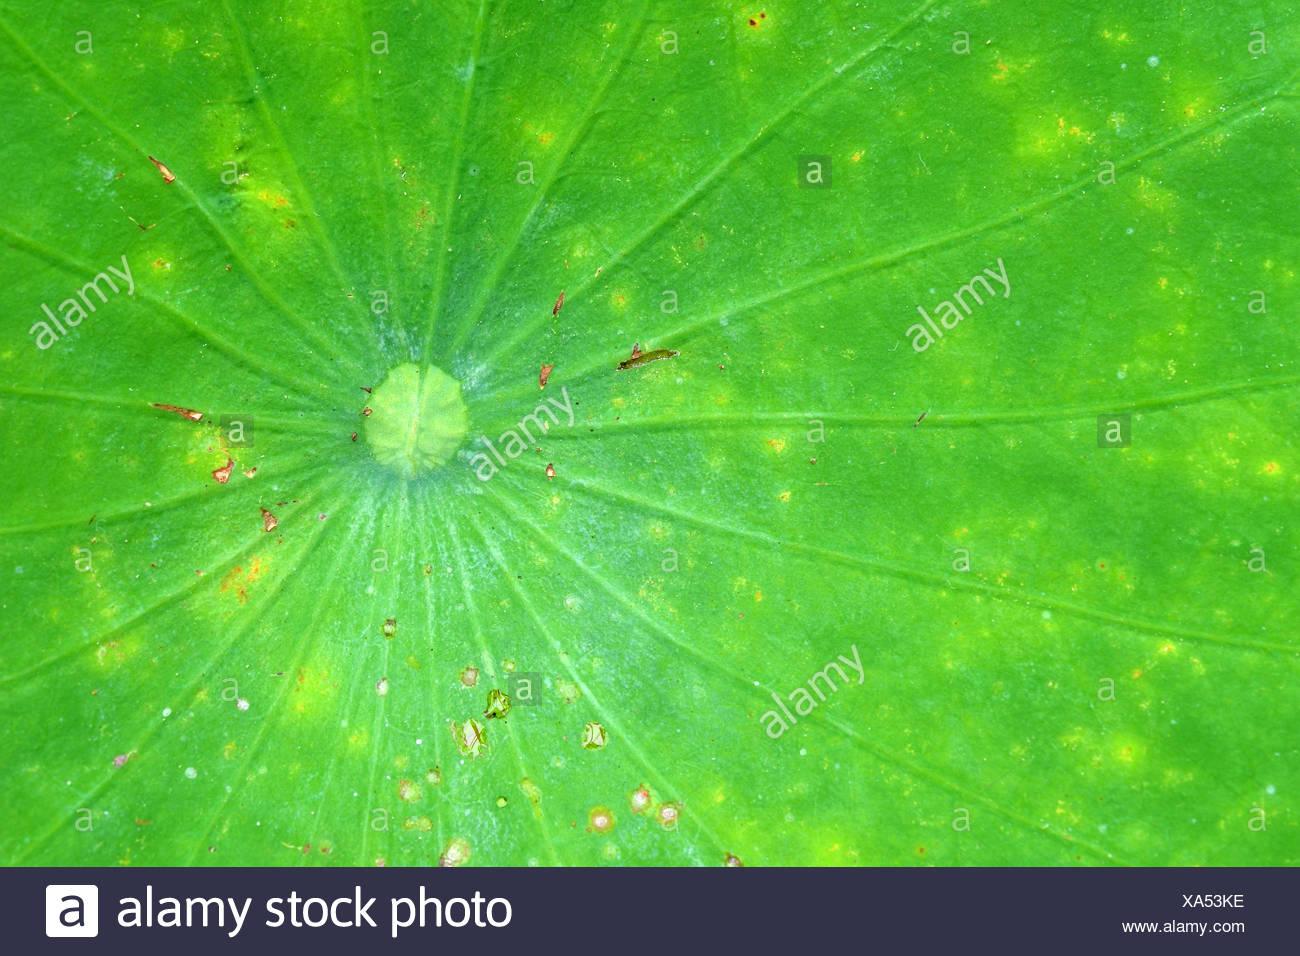 Veins of a lotus leaf. - Stock Image